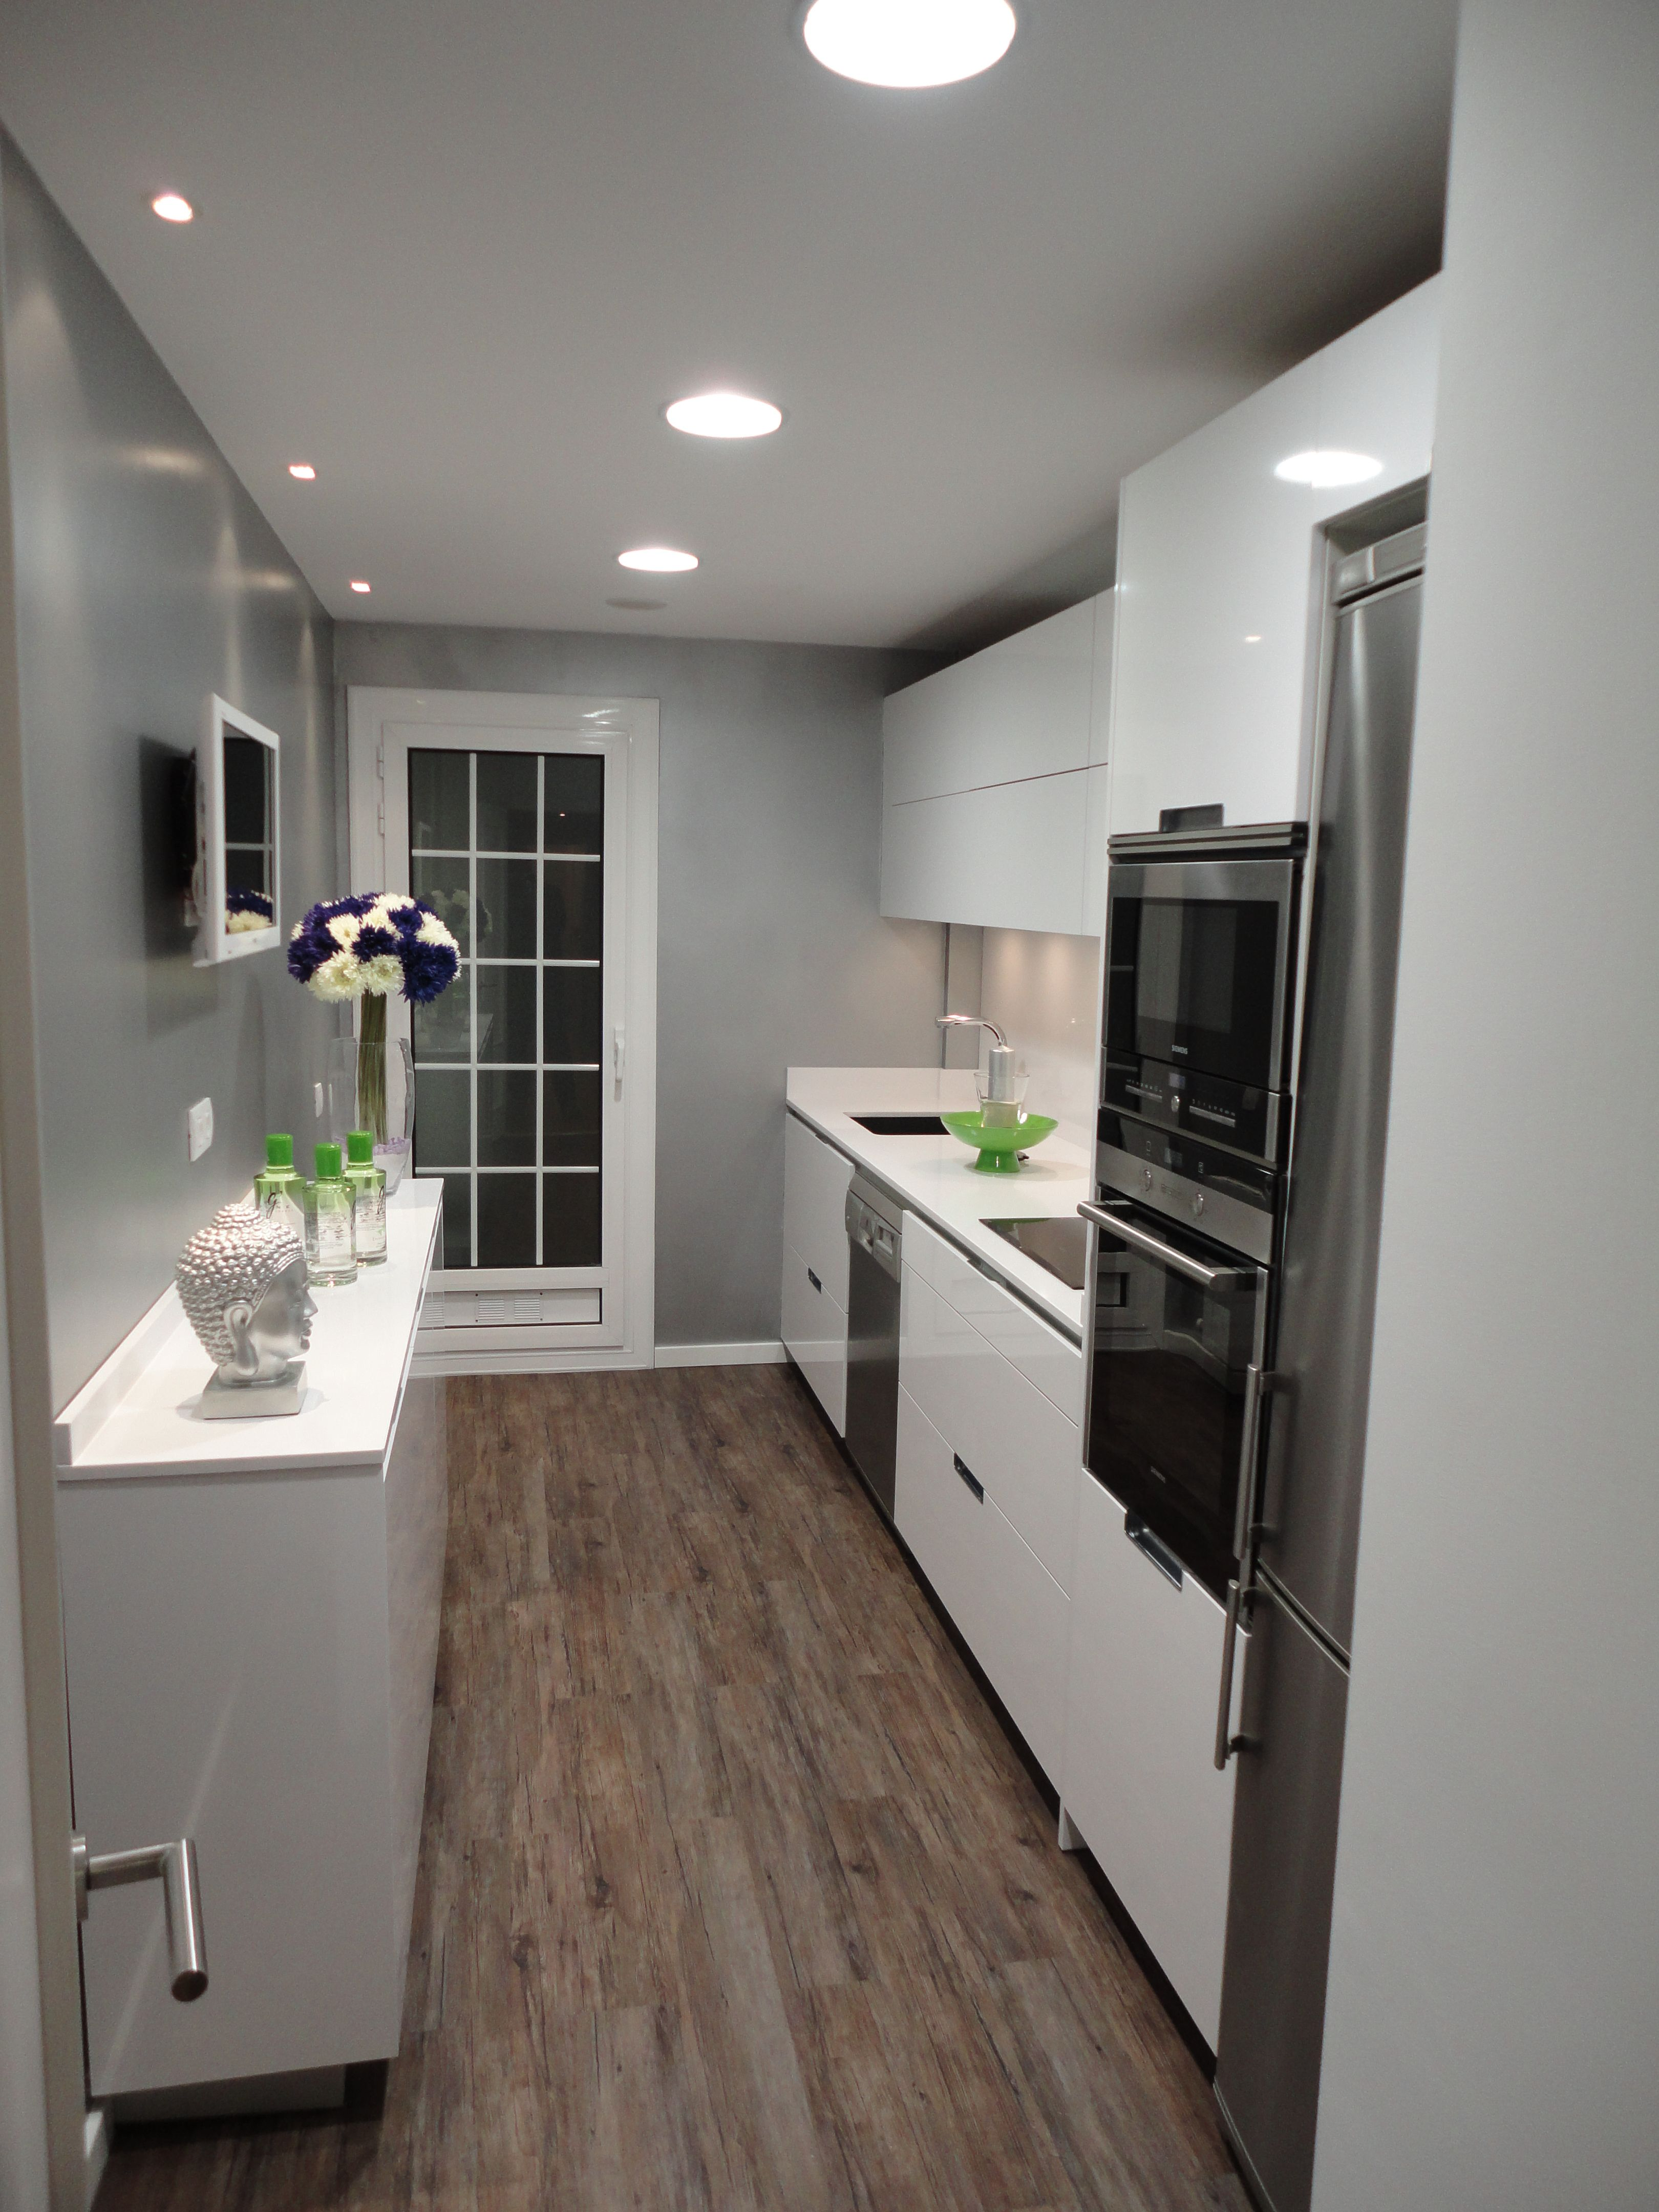 Spotlights puerta piso dise o decoraci n pinterest for Cocinas pequenas para departamentos